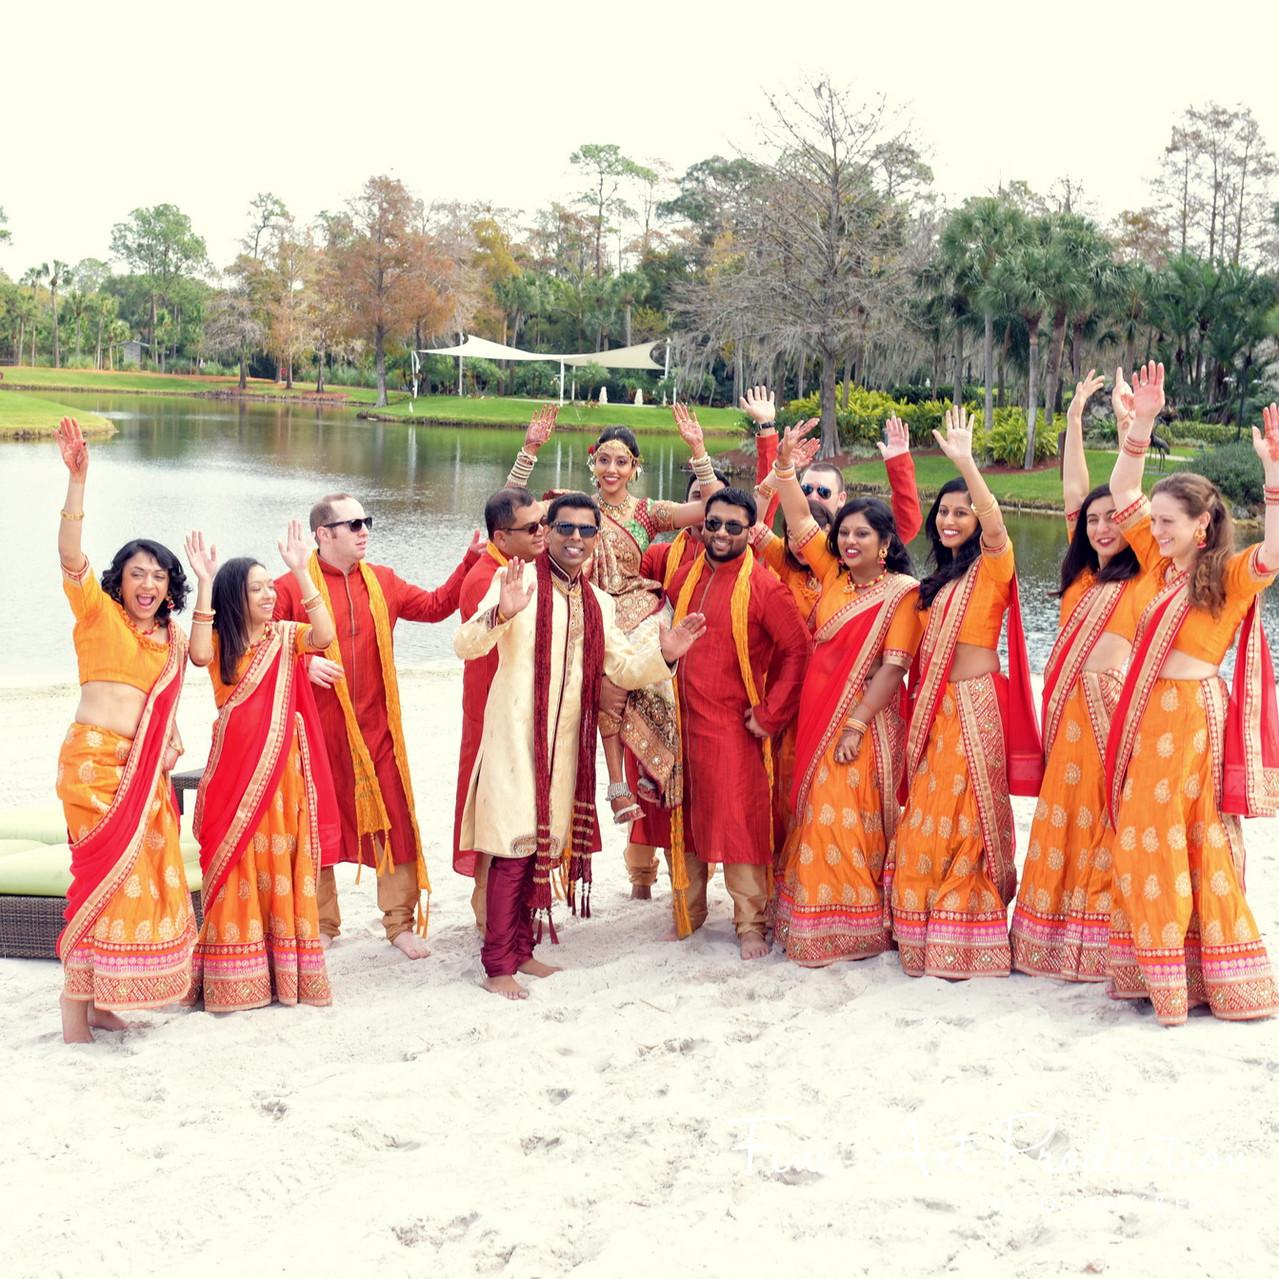 Hyatt-Regency-Grand-Cypress-Indian-Wedding-Photography-Fine-Art-Production-Amish-Thakkar_35